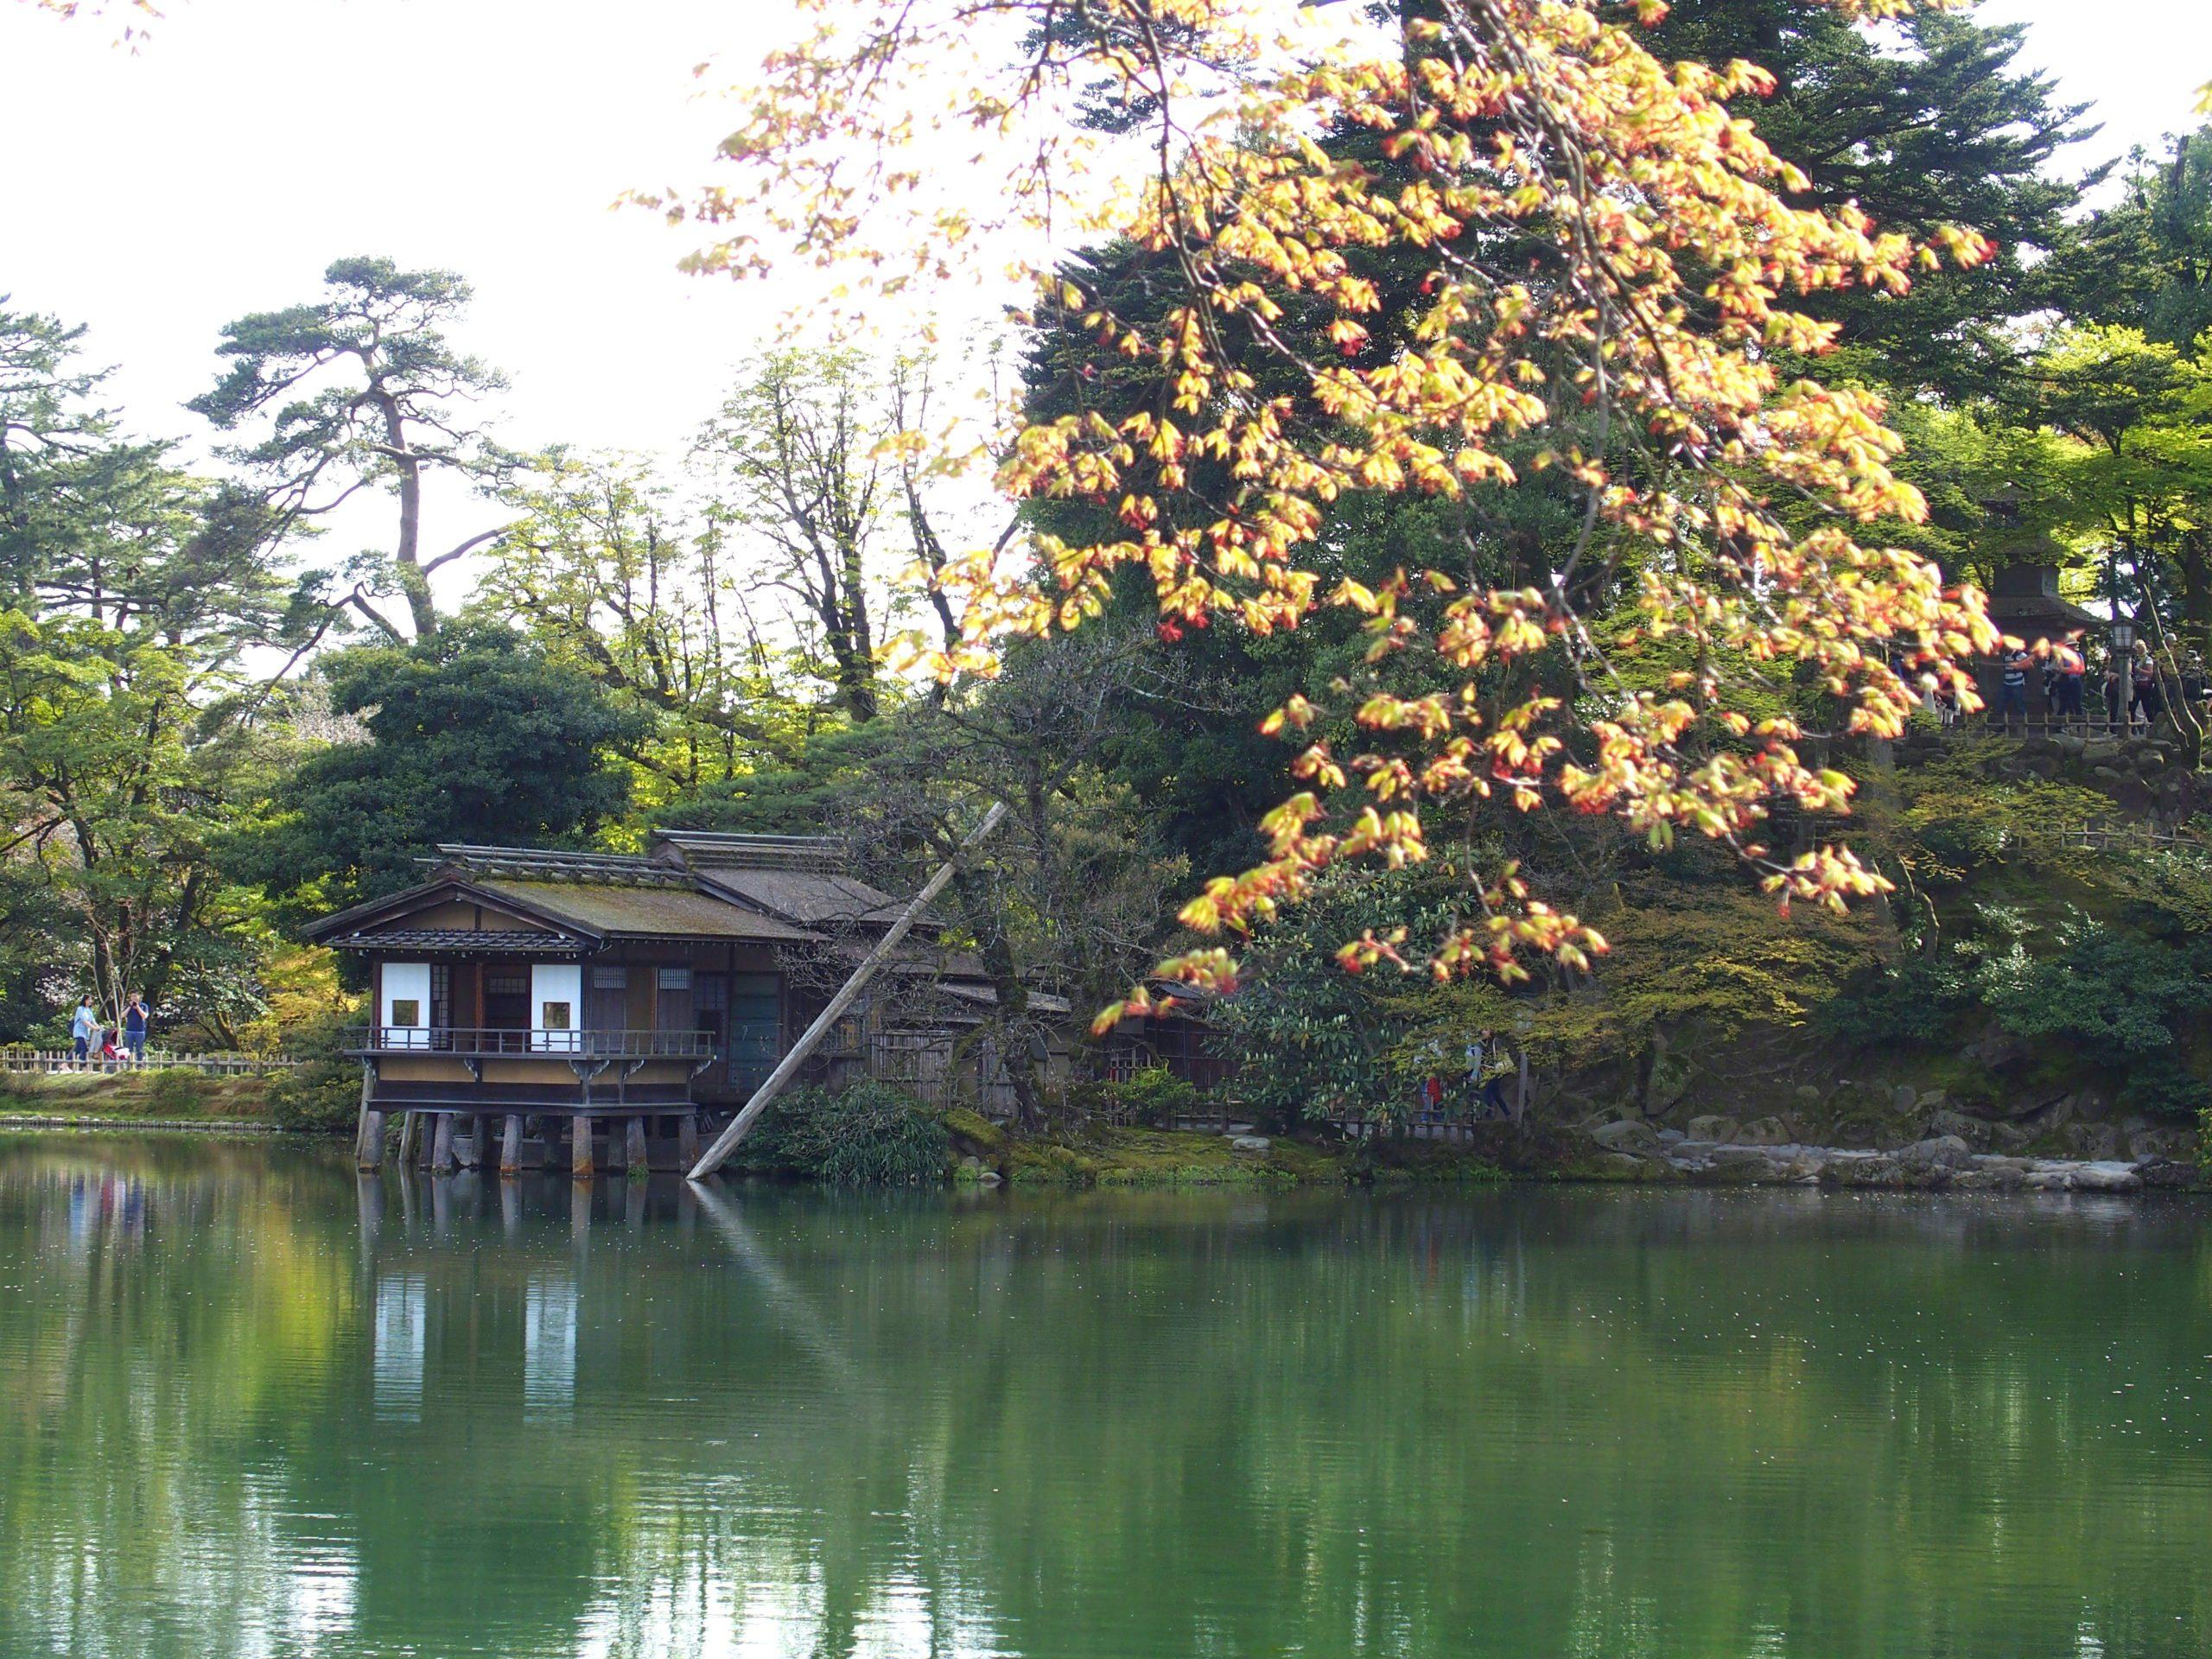 Maison de thé sur l'étang jardin Kenrokuen Kanazawa Japon